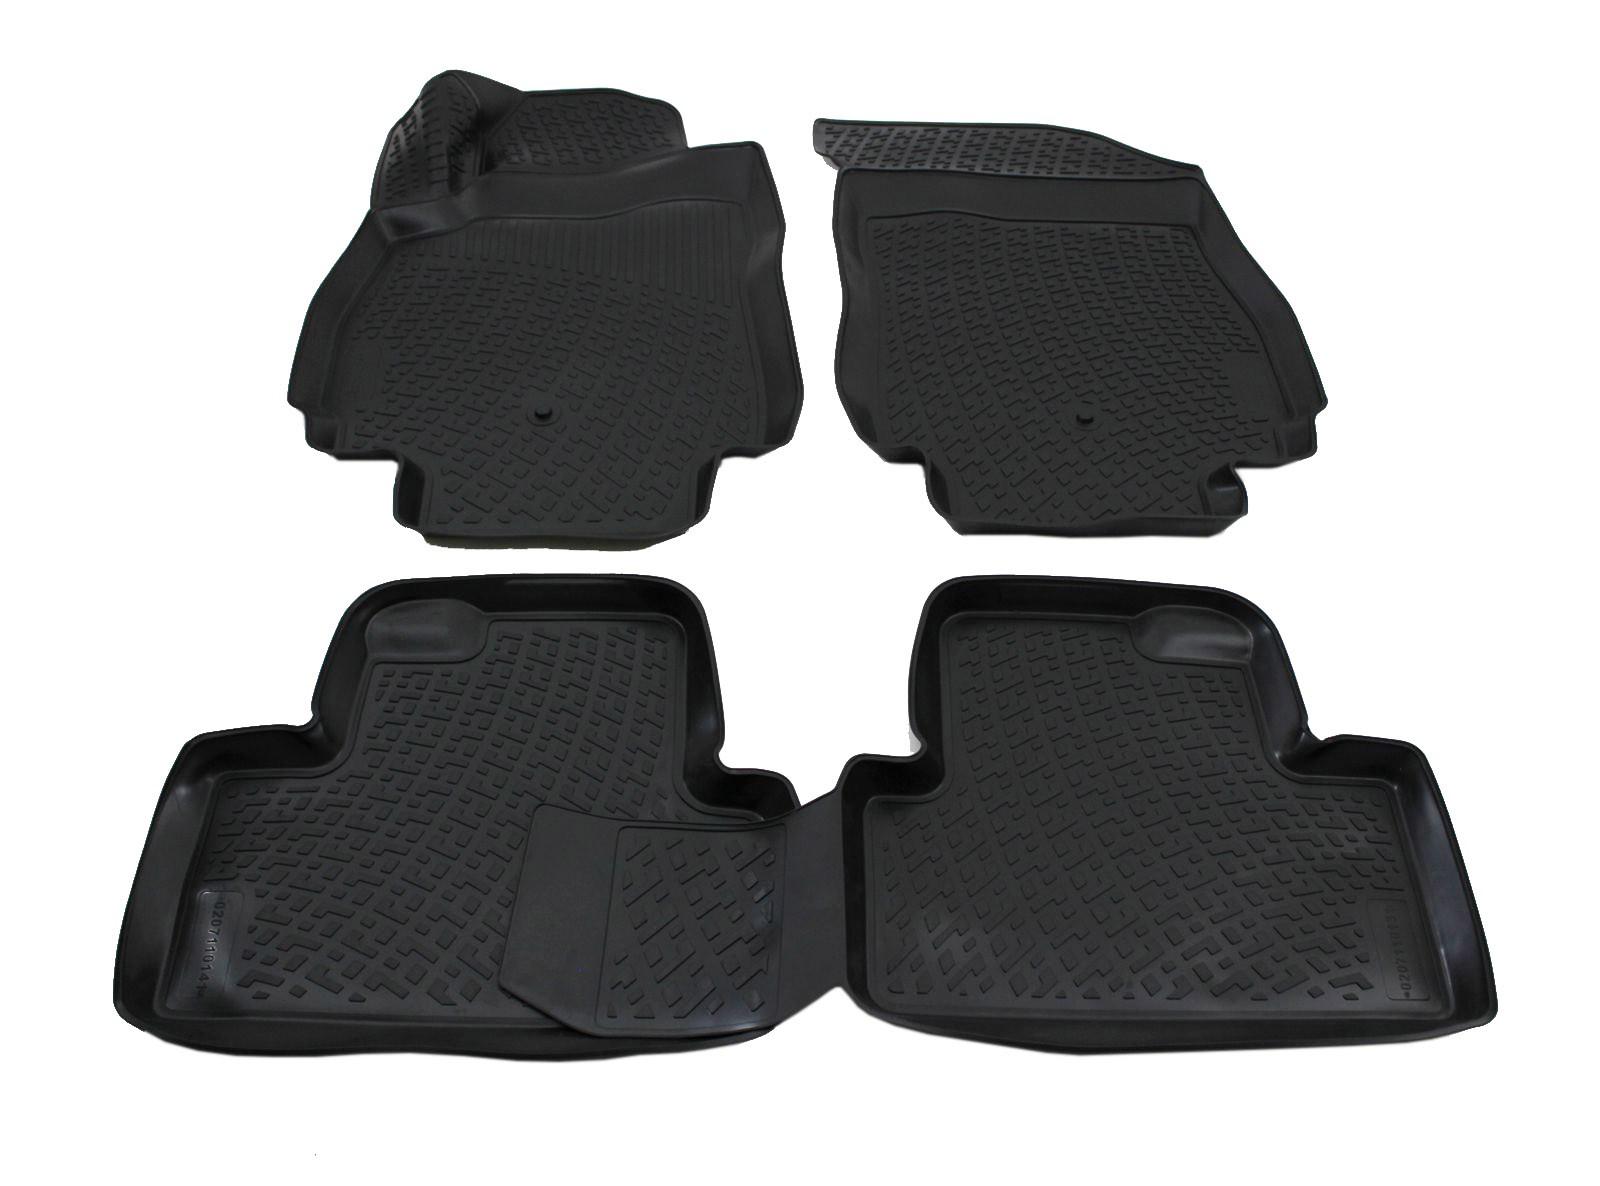 Poza cu Covorase din cauciuc tip tavita Premium, Chevrolet Orlando, 2011-2018